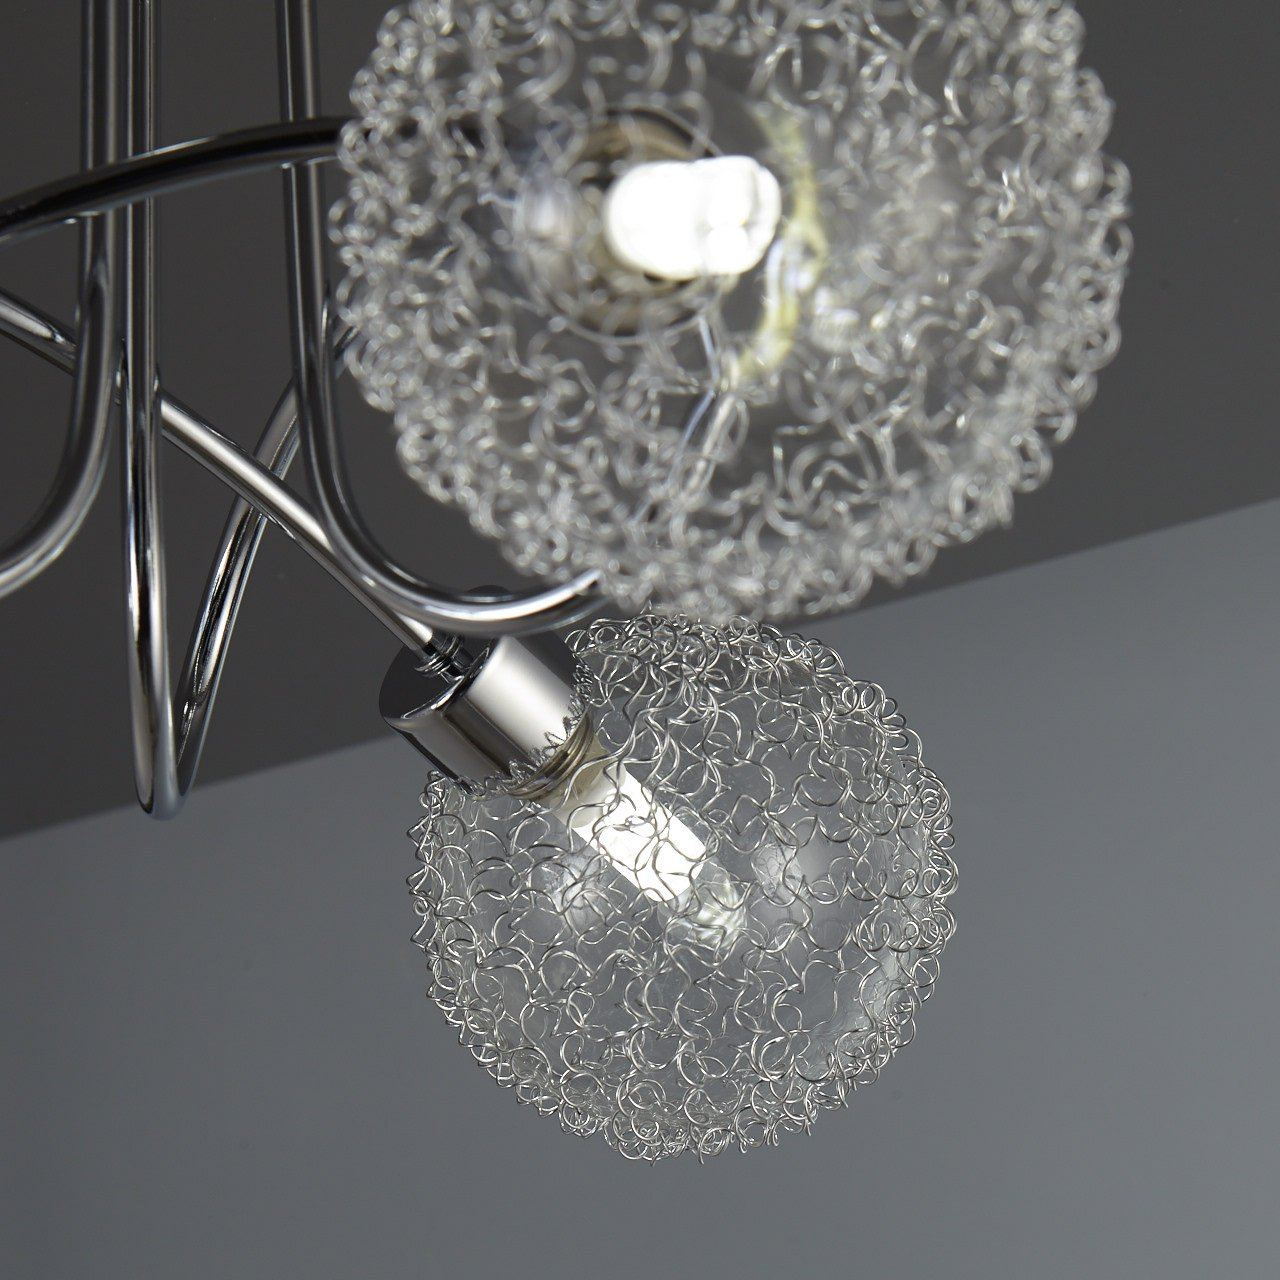 LED ceiling lamp I pivotable I metal glass design in chrome I round glass ornaments I warm white I 3 x 3,5 W illuminants I 230 V I G9 I IP20 [Energy Class A+] B.K.Licht BKL1038